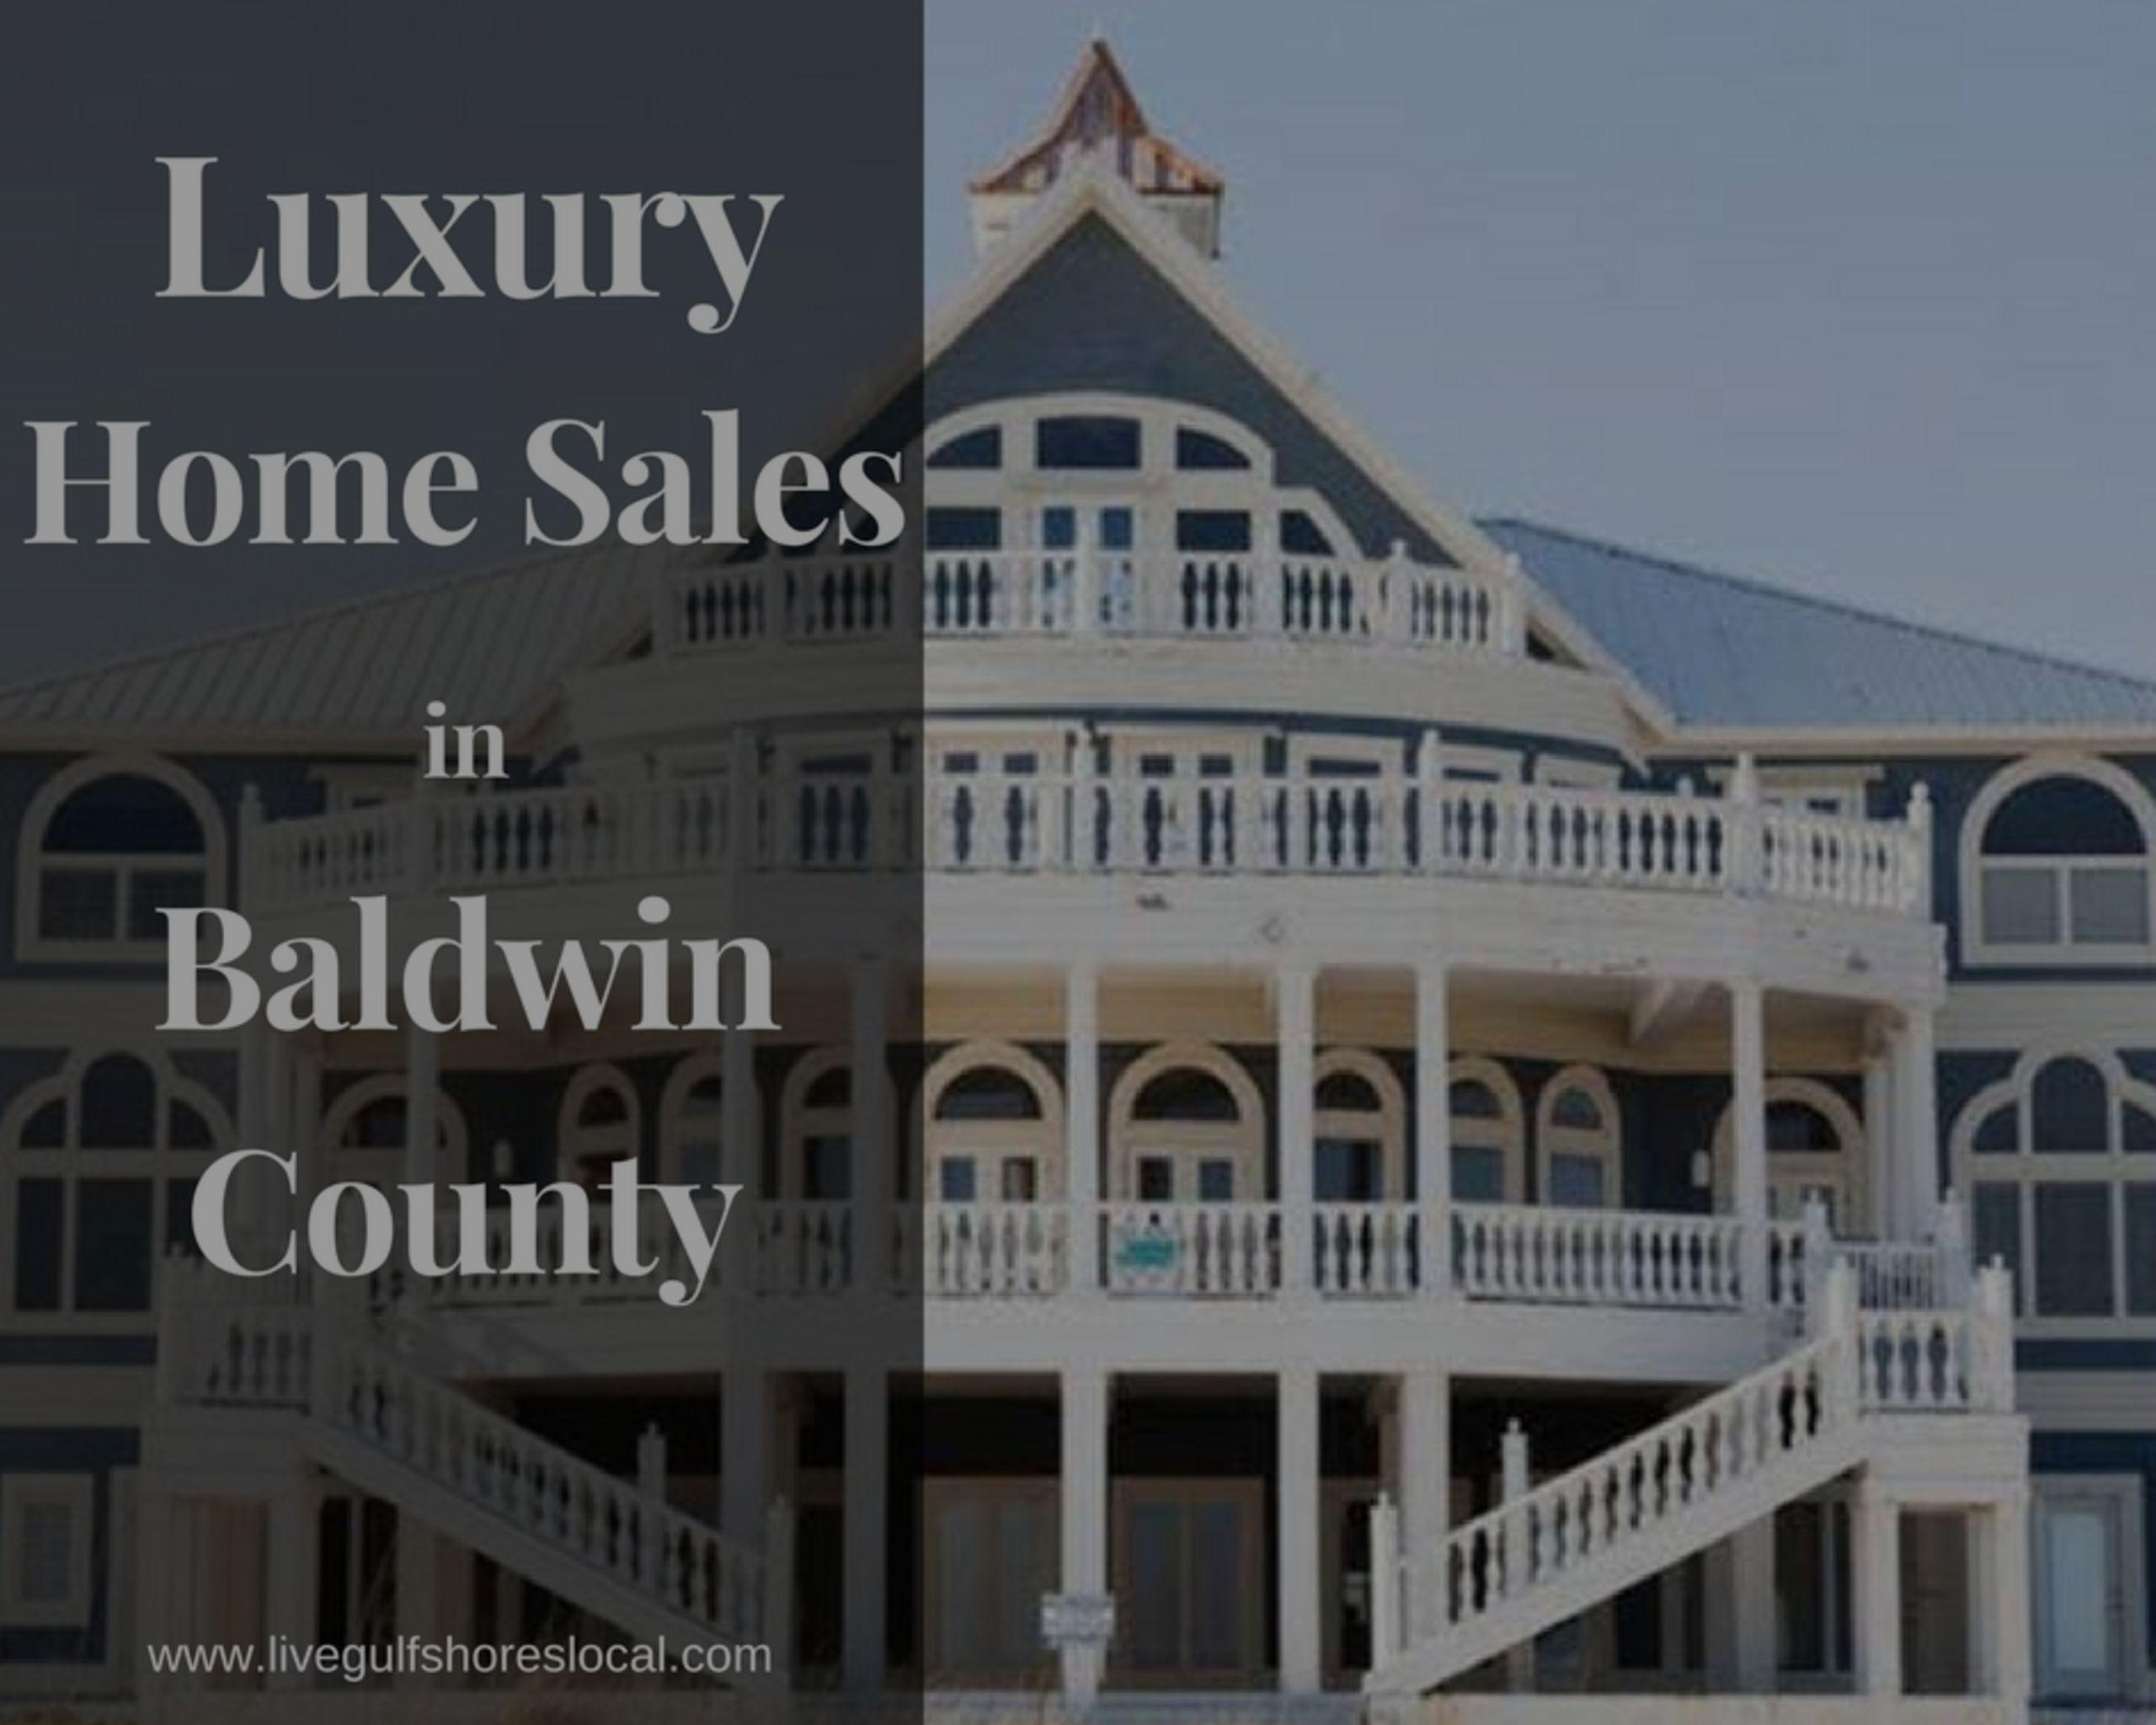 Luxury Home Sales in Baldwin County – December 2017